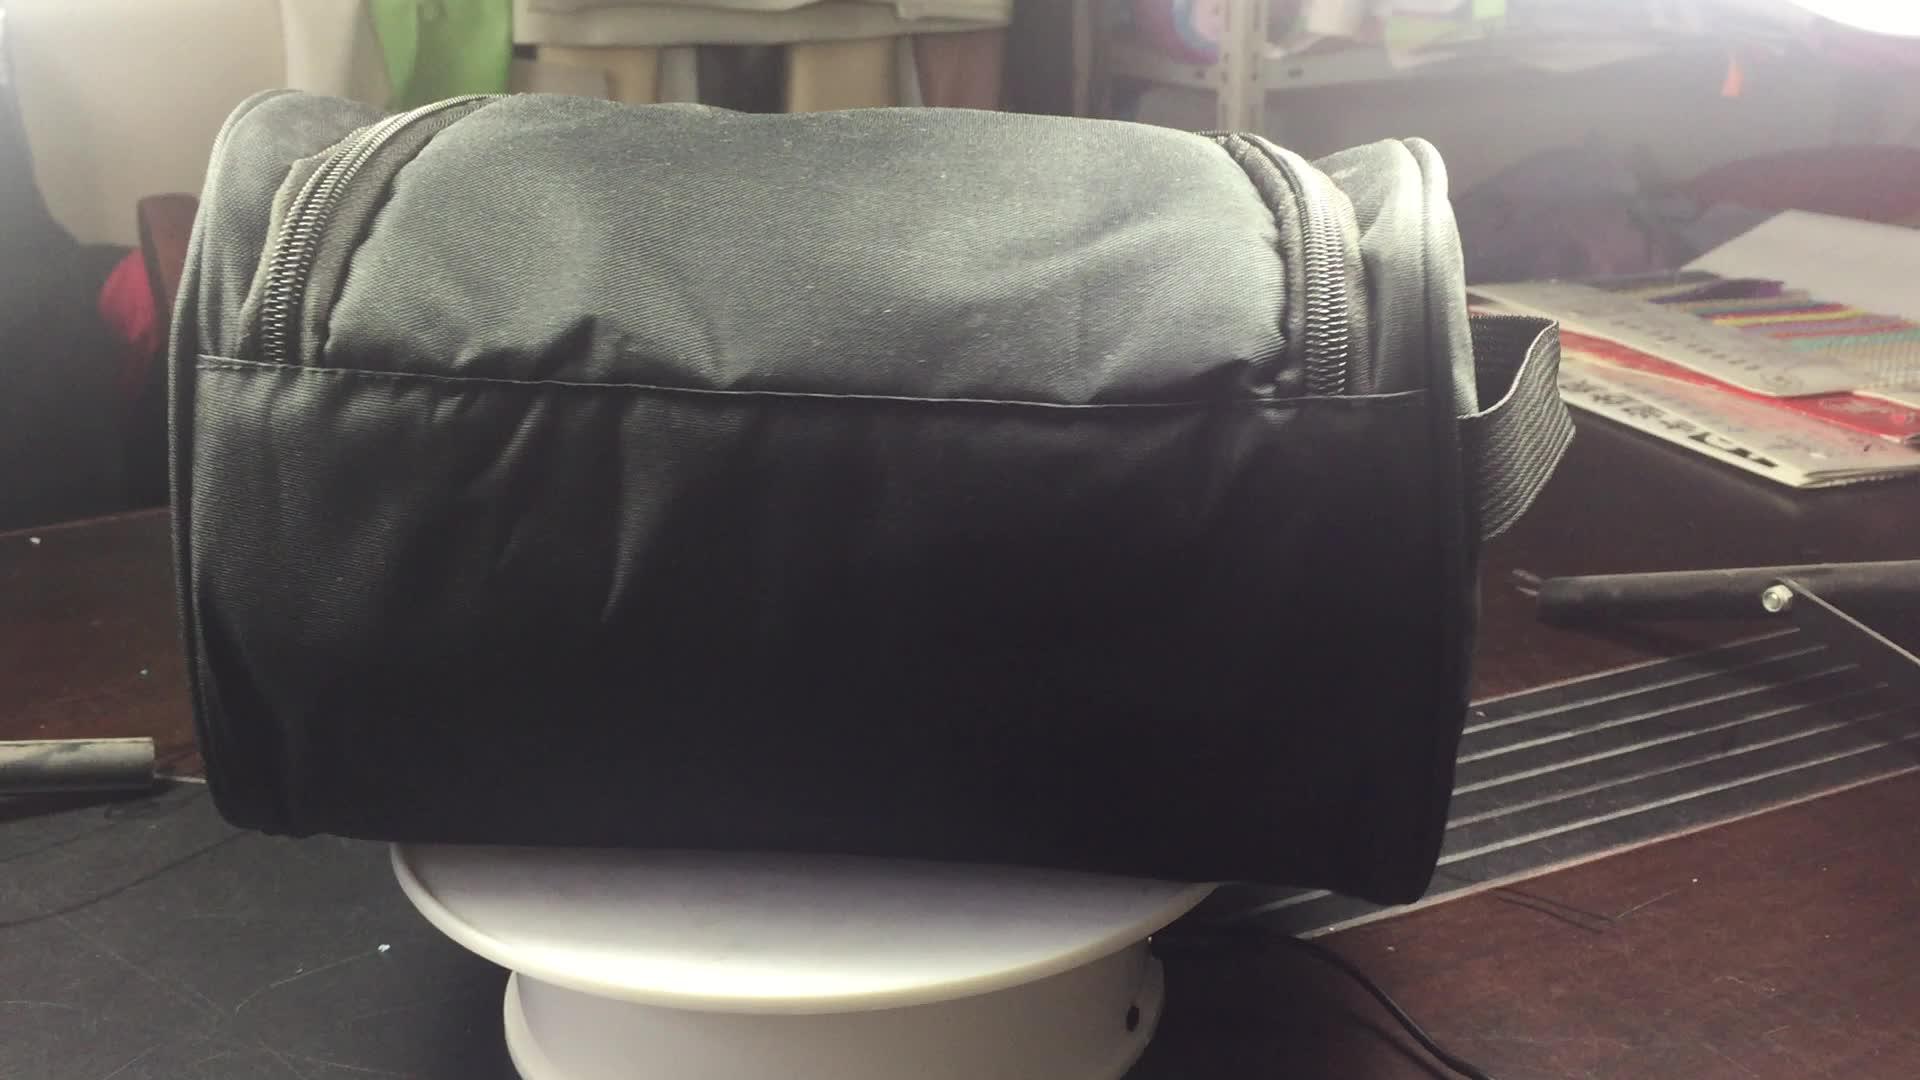 300D travel toilet bag